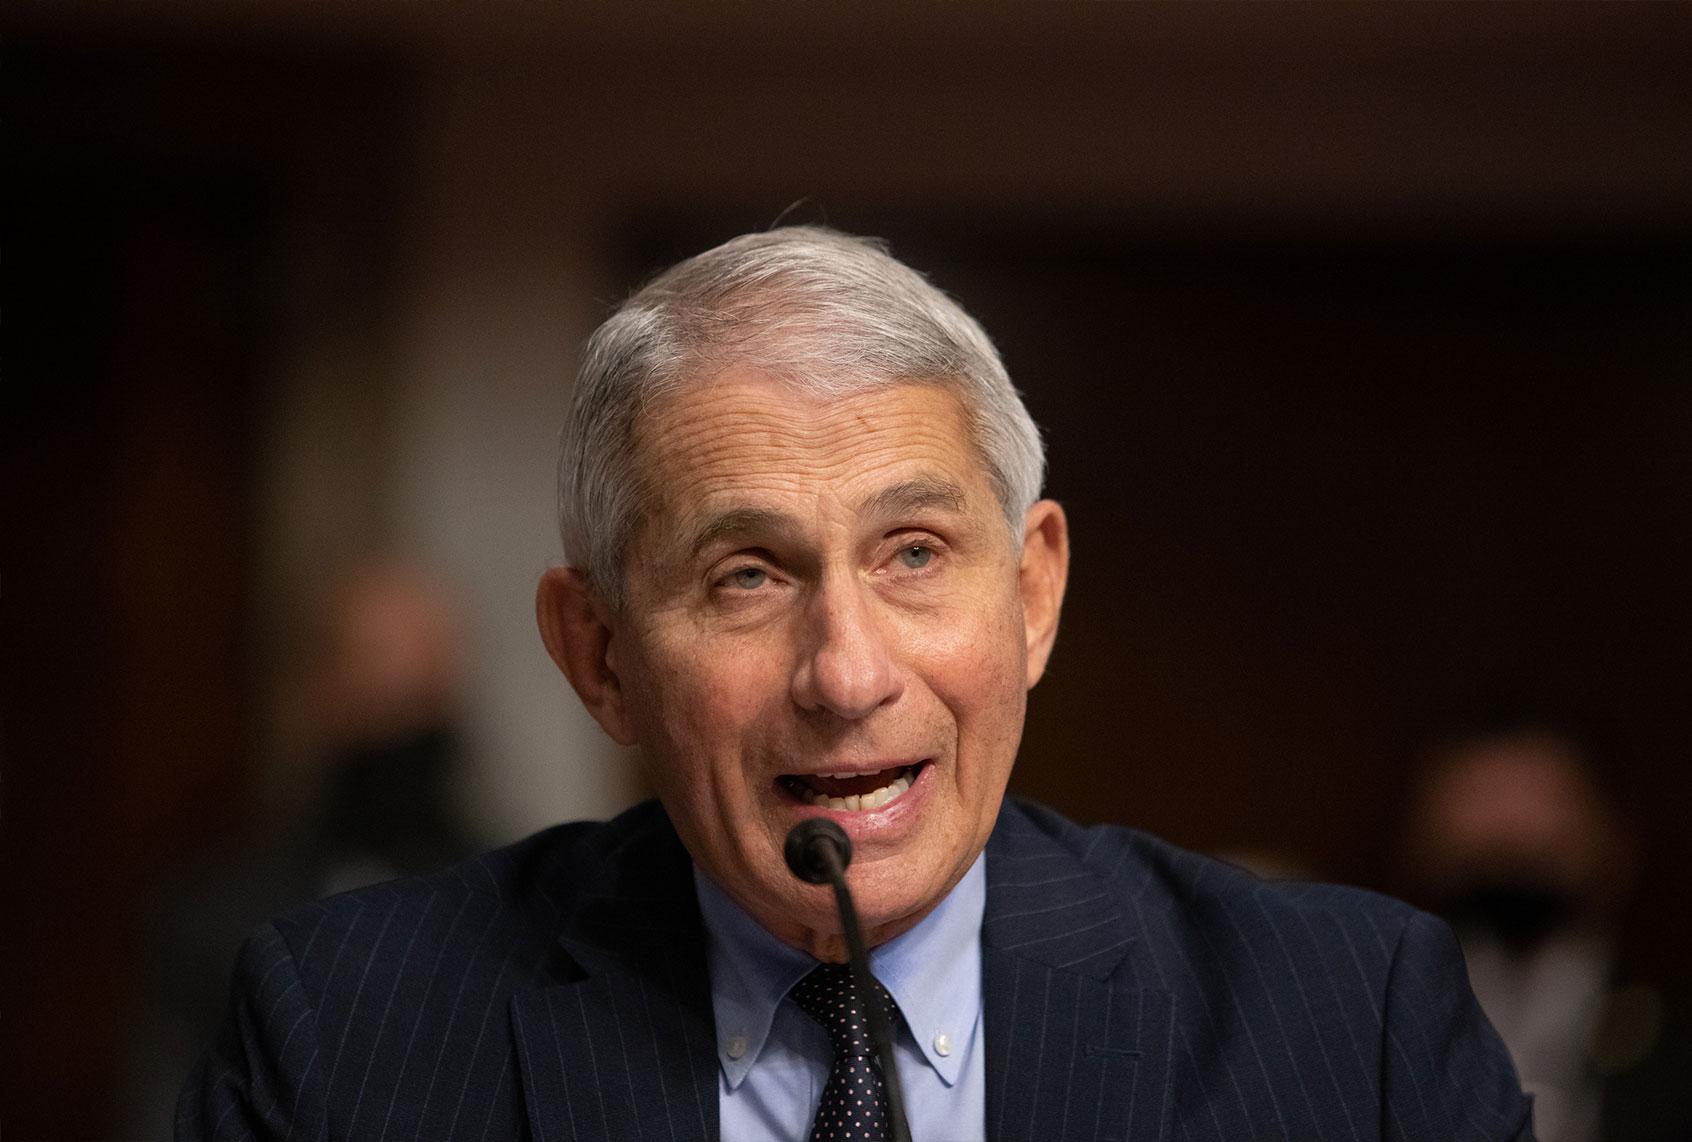 In Senate hearing, Fauci raises alarm over long-term...